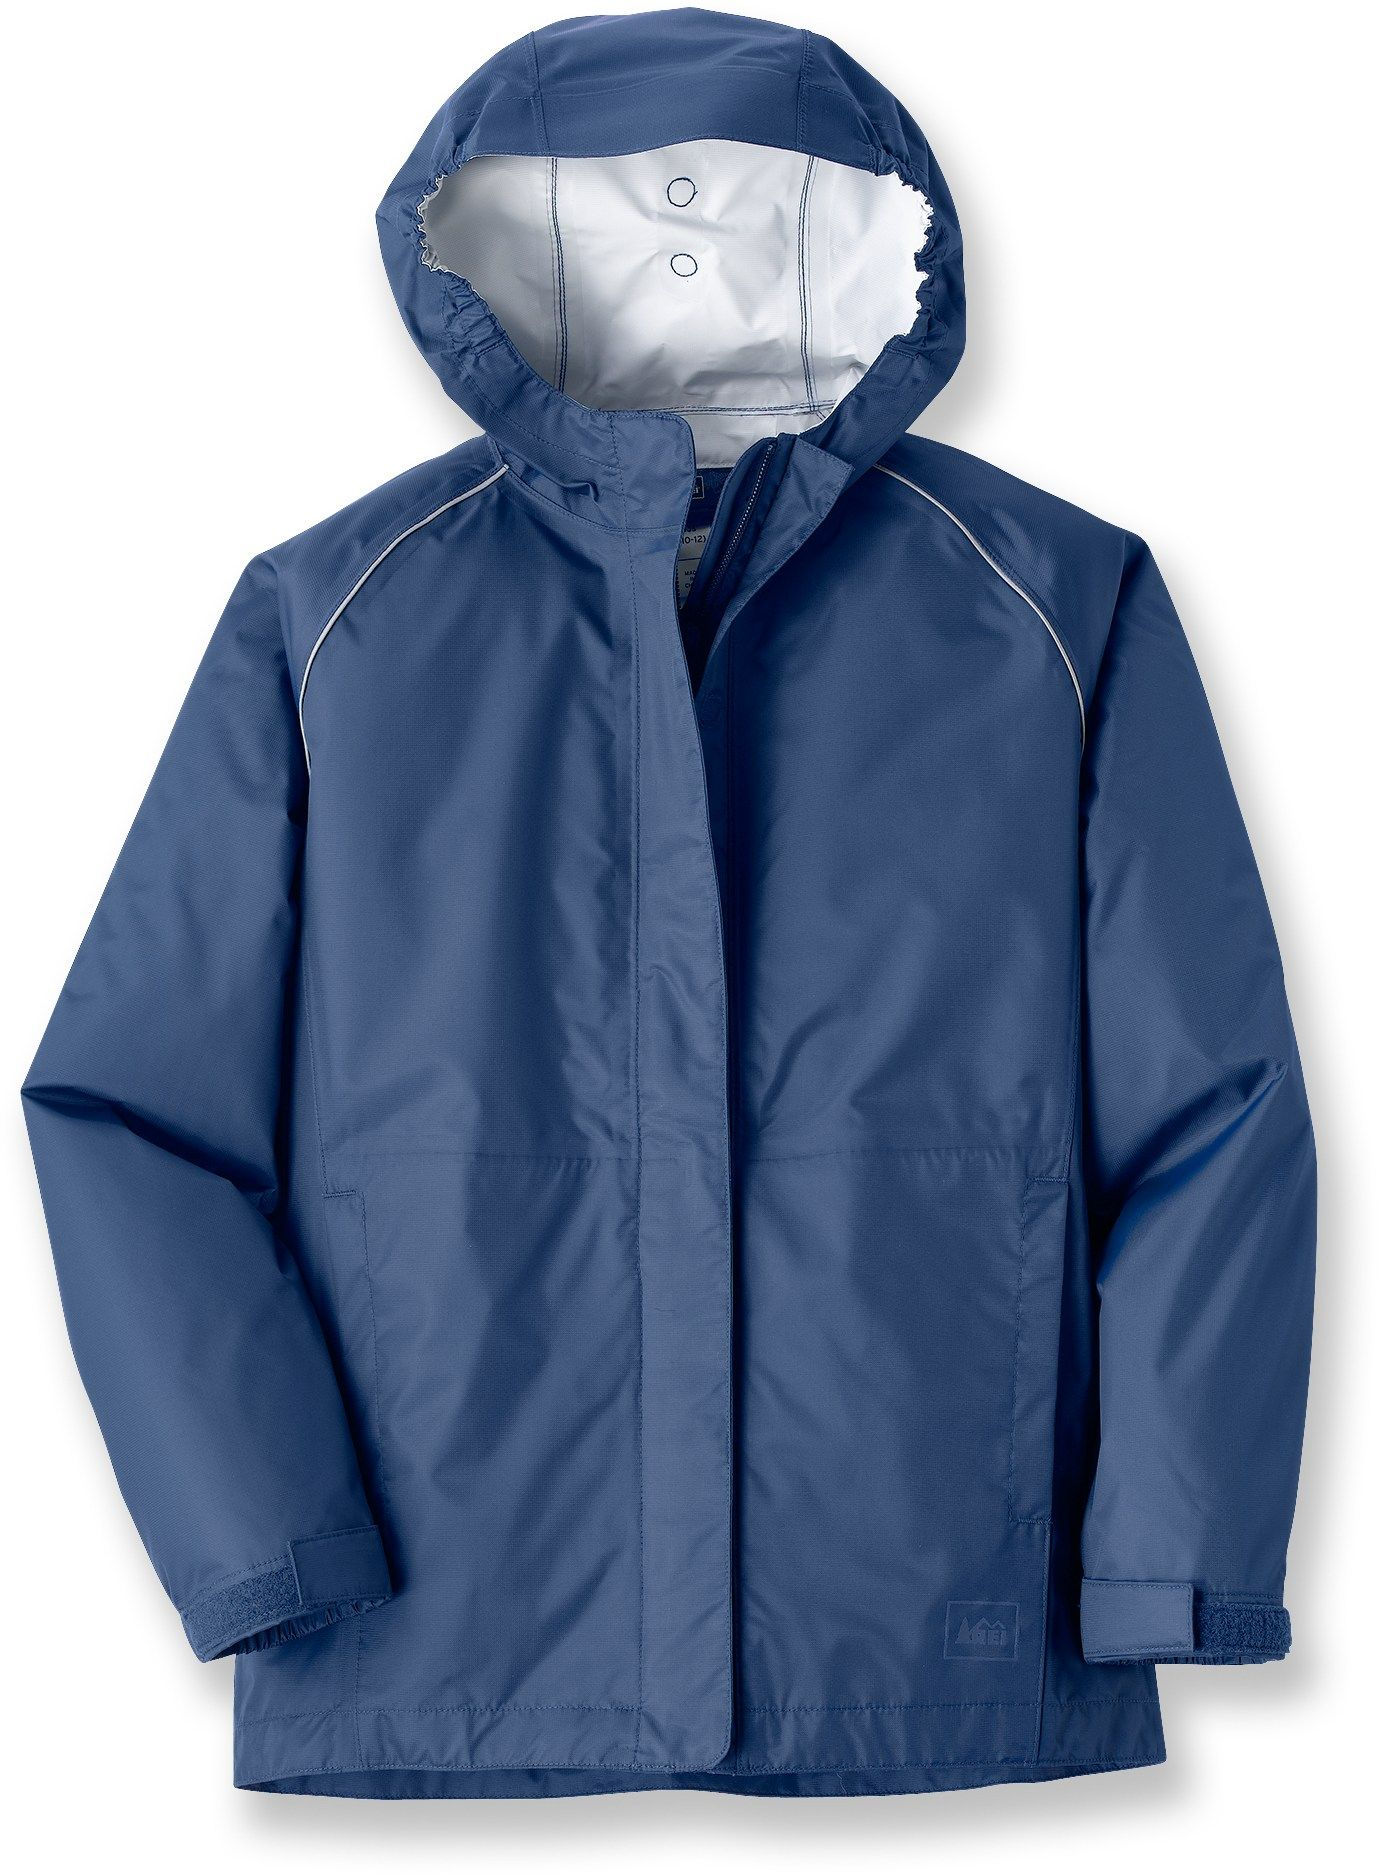 d1e160dc Co-op Cascade Rain Jacket - Boys' | REI Co-op | My Scouter's Woods ...